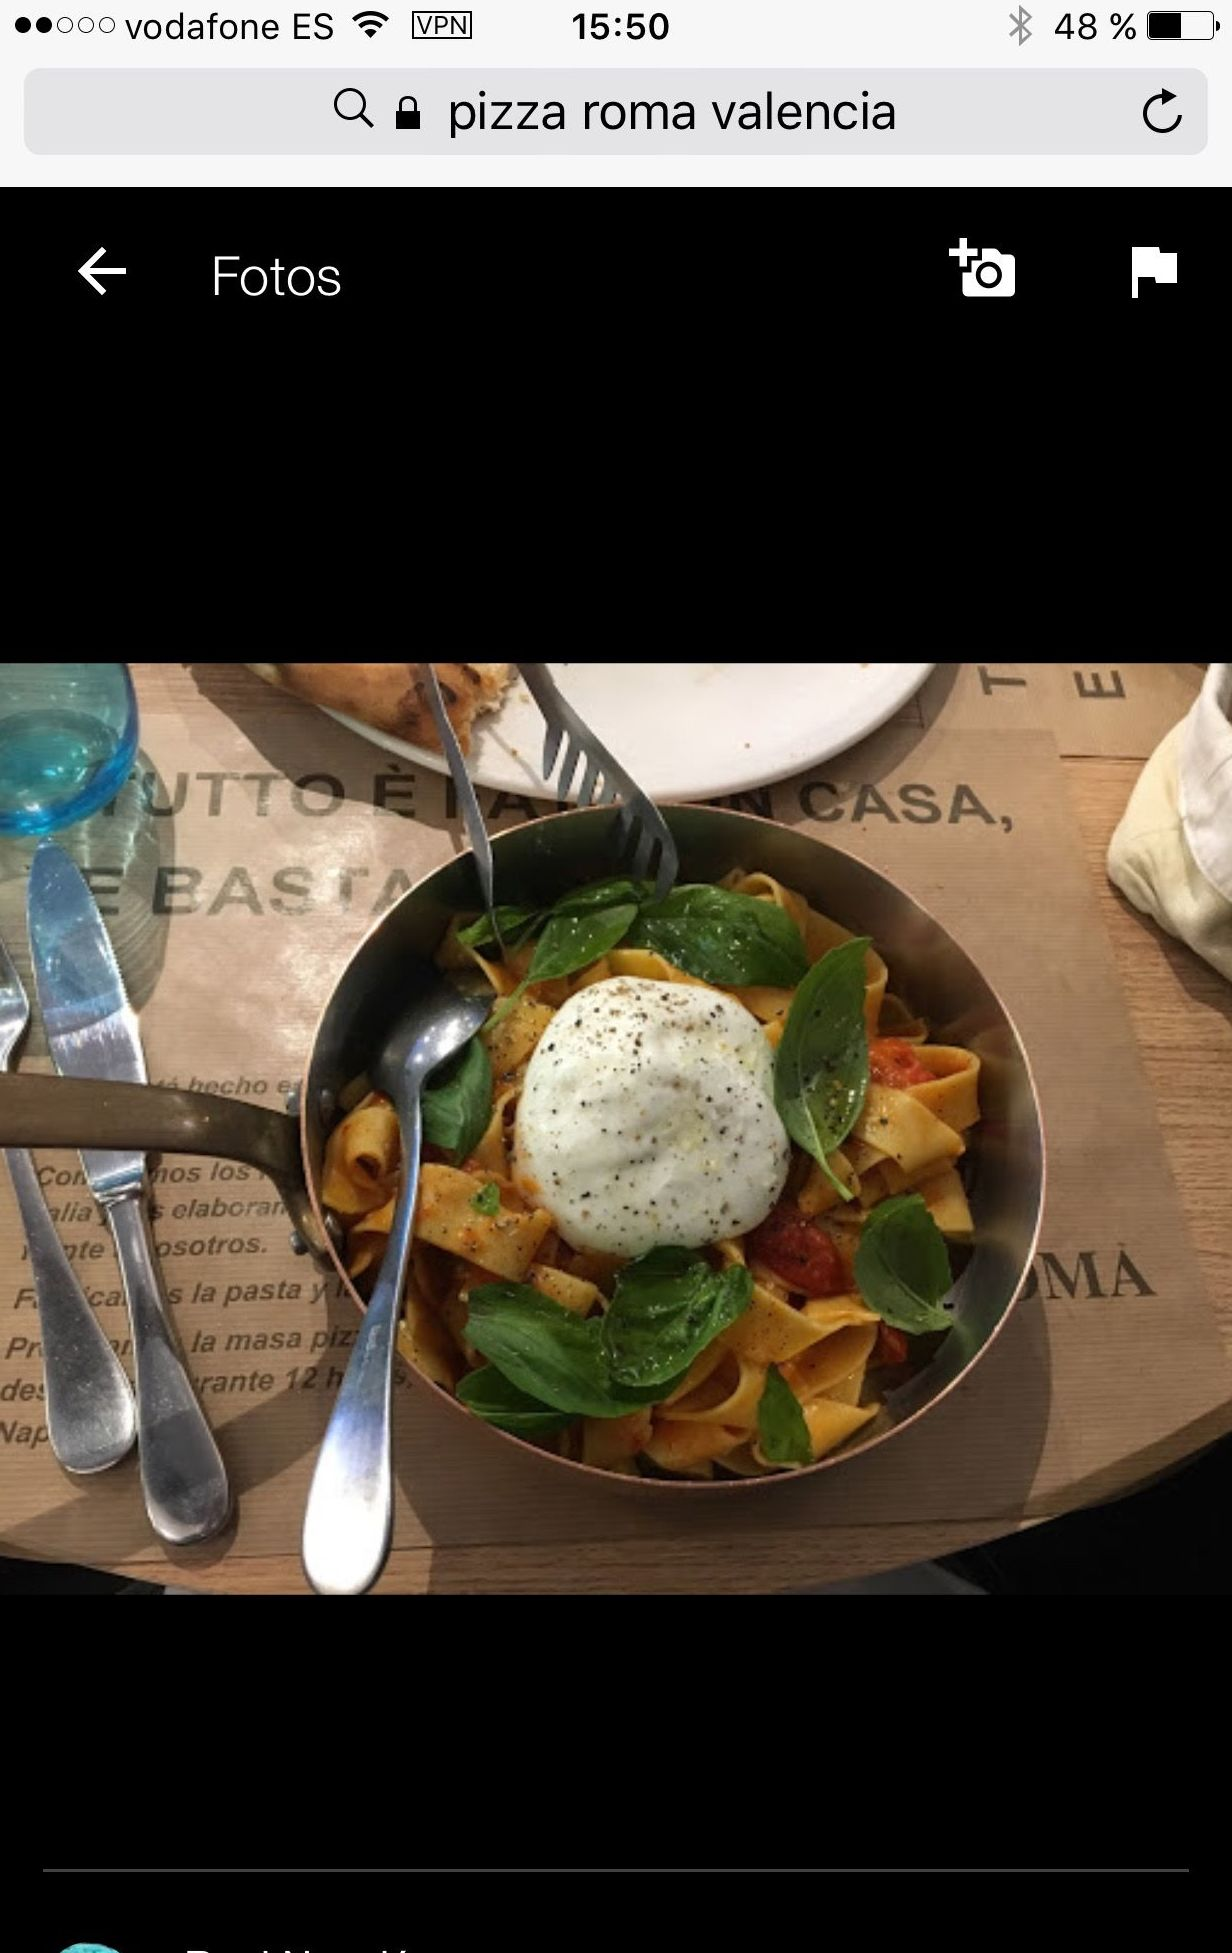 Foto 45 de Cocina italiana en VALENCIA | Pizza Roma